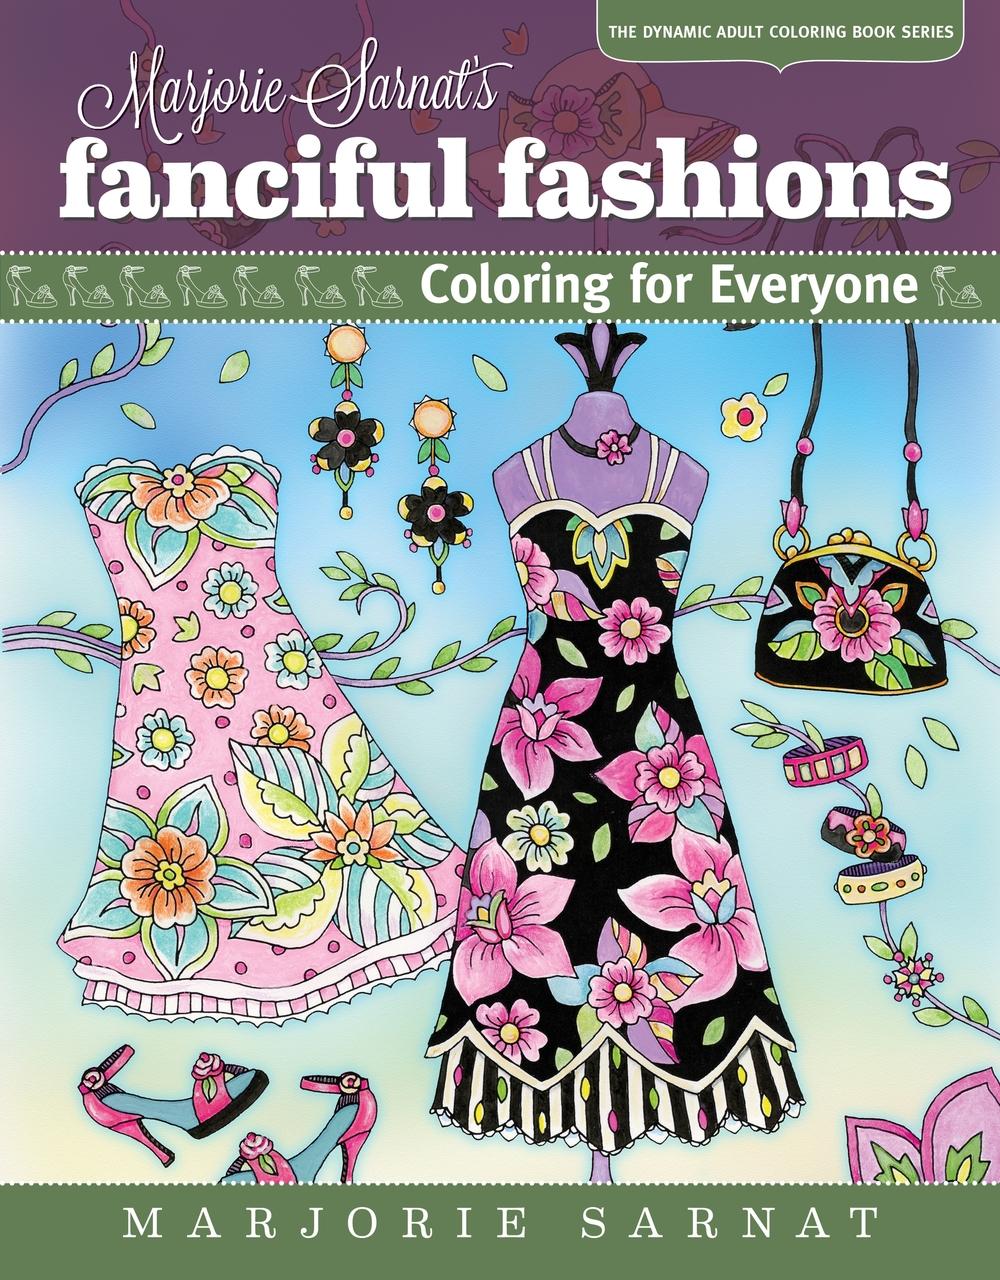 Marjorie Sarnat Fanciful Fashions.jpg